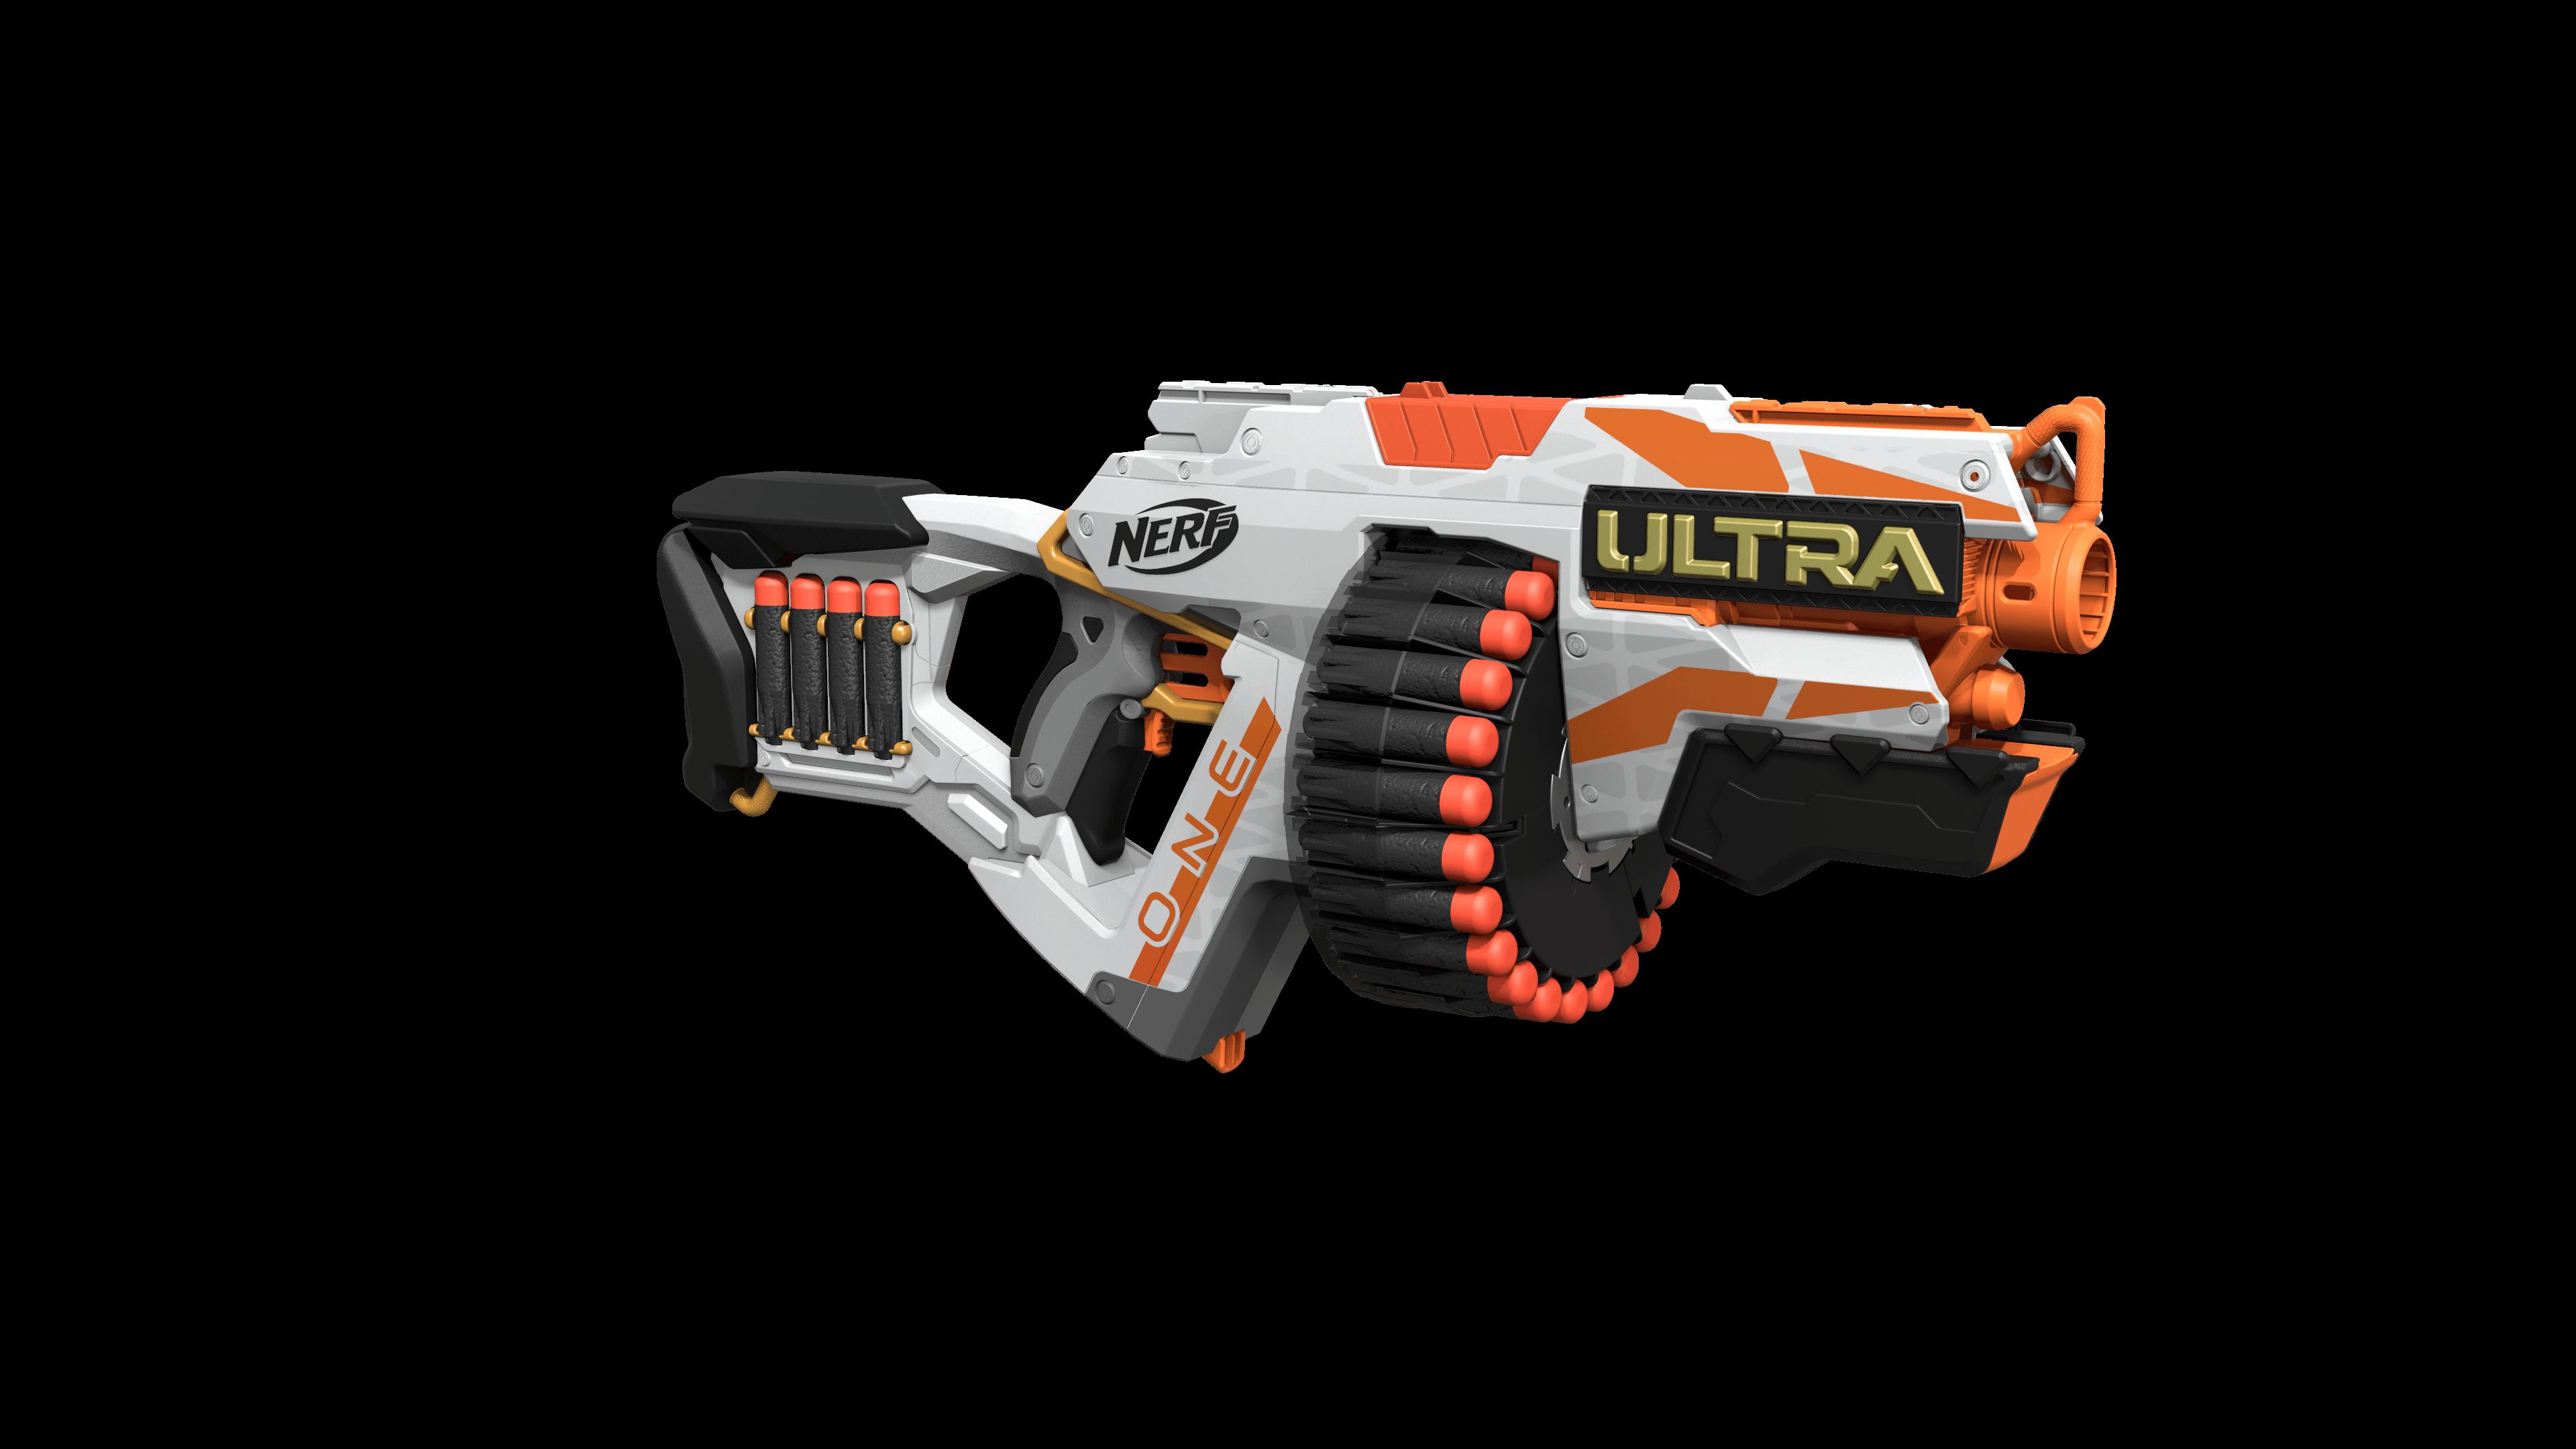 ultra blaster img 111